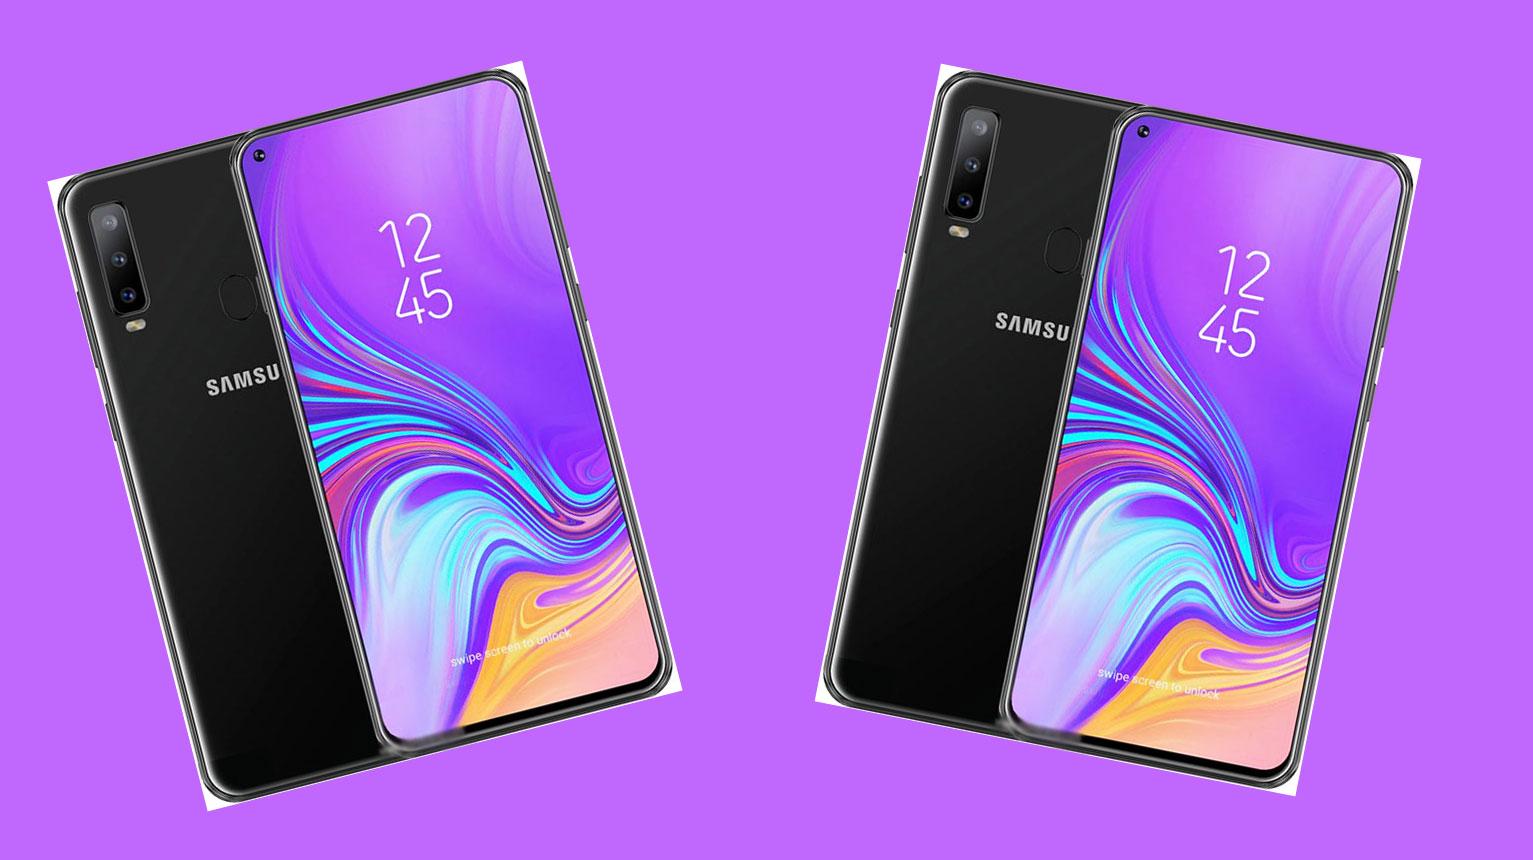 مواصفات هاتف Samsung Galaxy قبيل طرحه بالأسواق